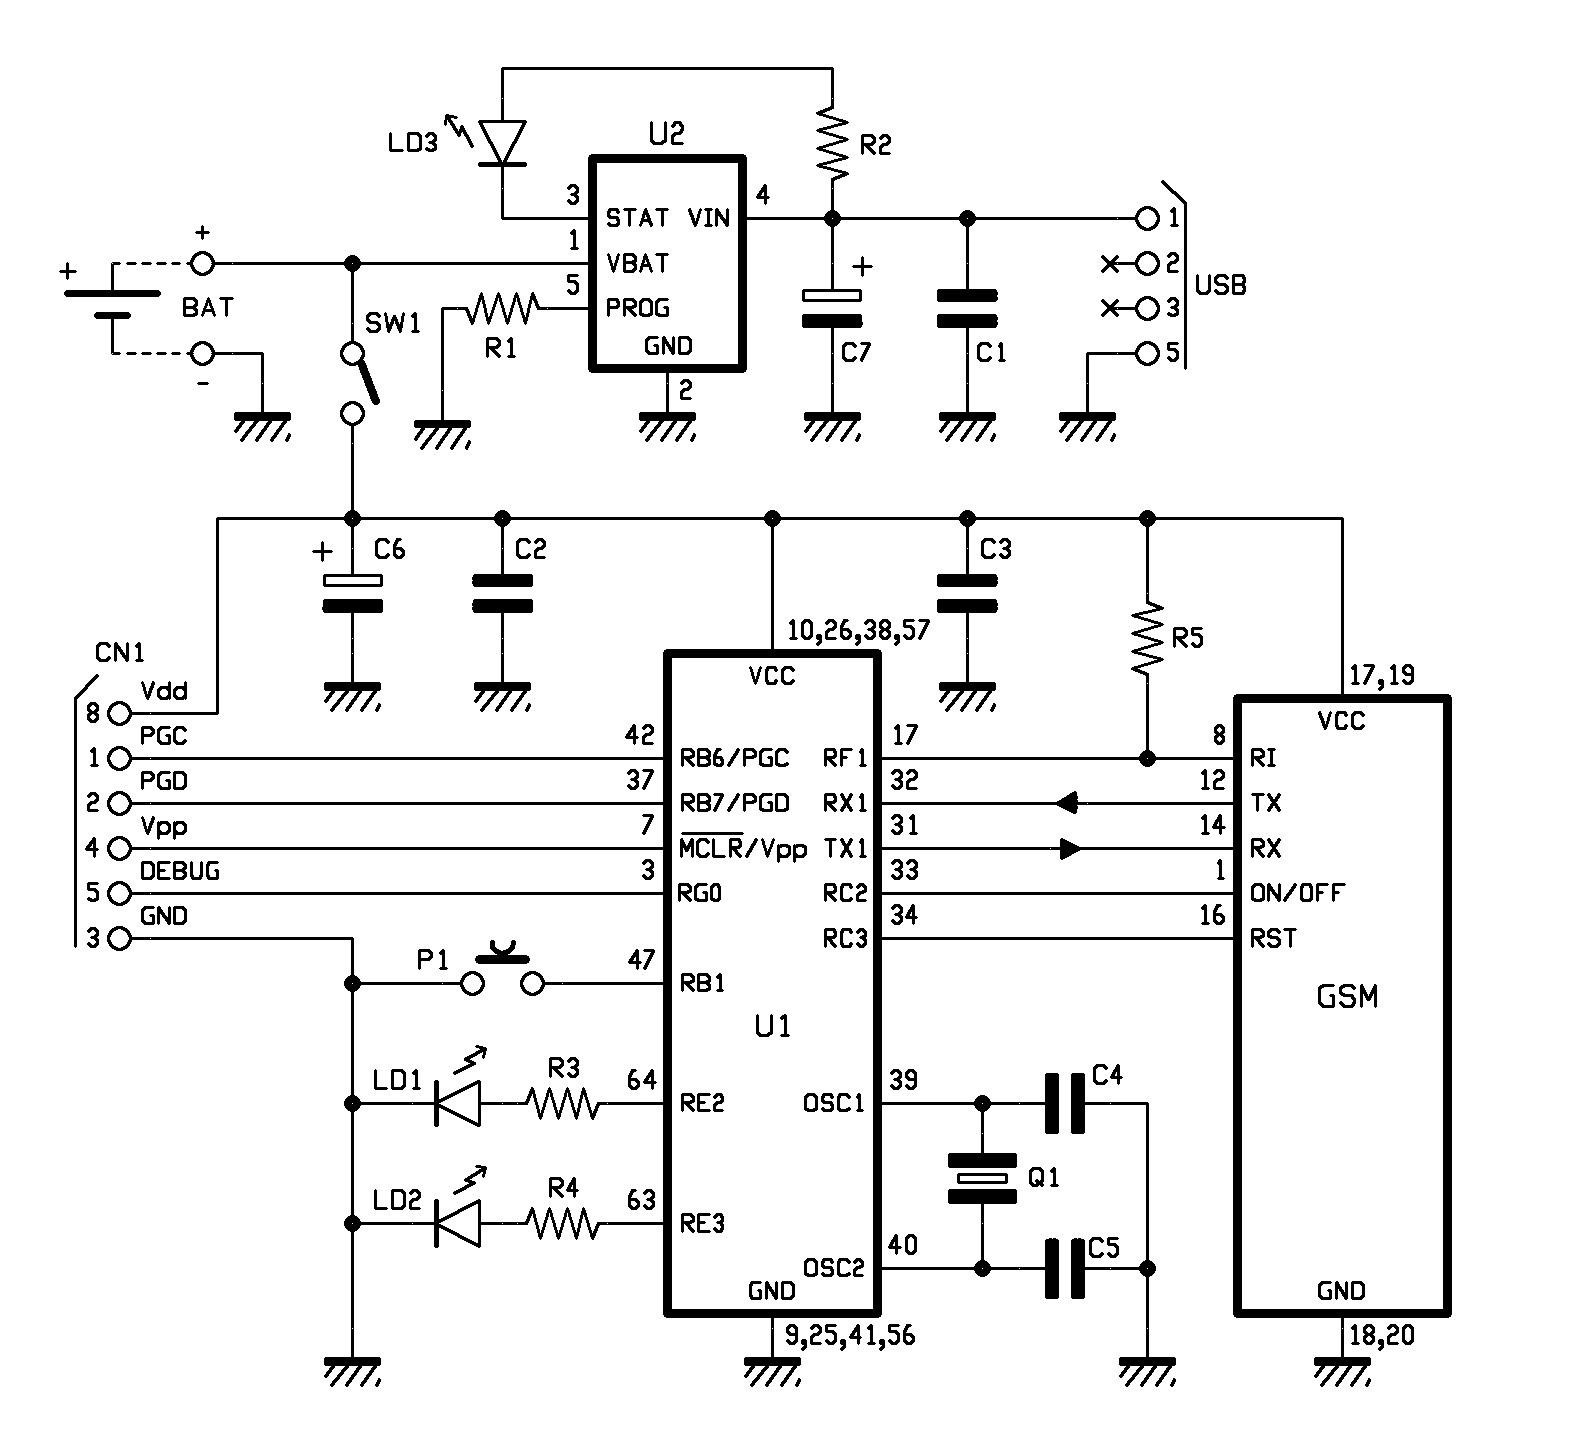 hight resolution of gps charger wiring diagram electrical drawing wiring diagram u2022 garmin 3210 wiring diagram garmin garmin marine chartplotter